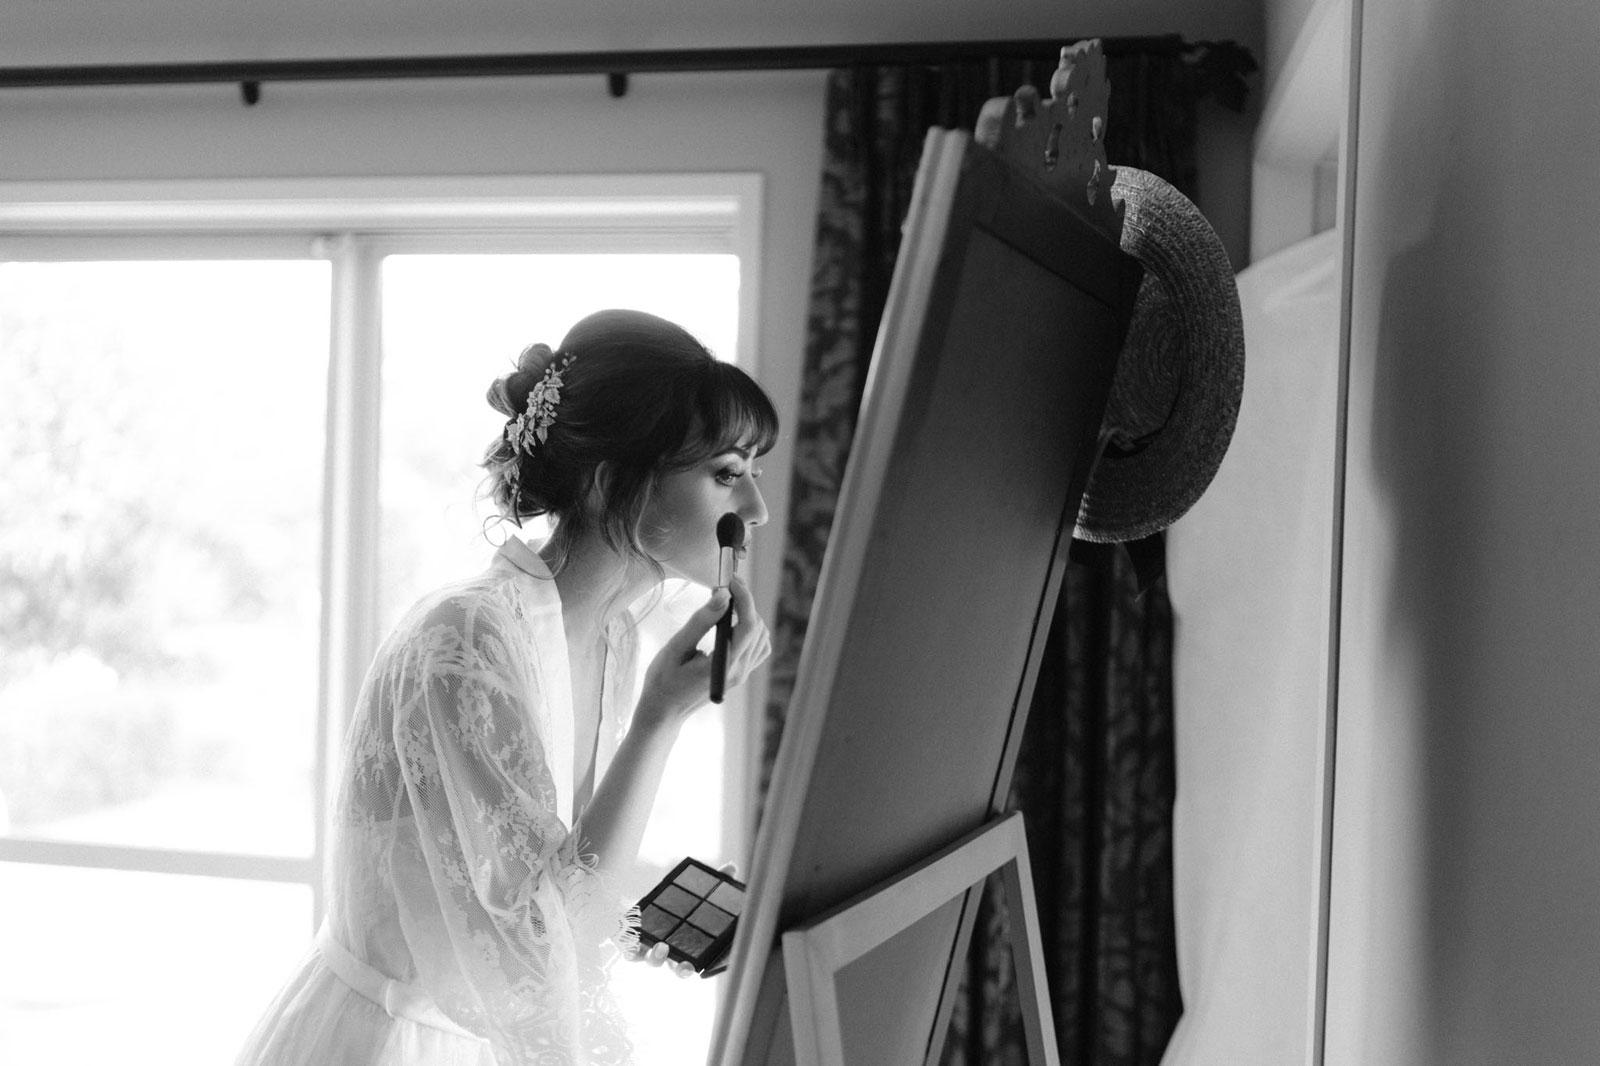 newfound-n-c-olive-tree-cottage-tauranga-wedding-photographer-25